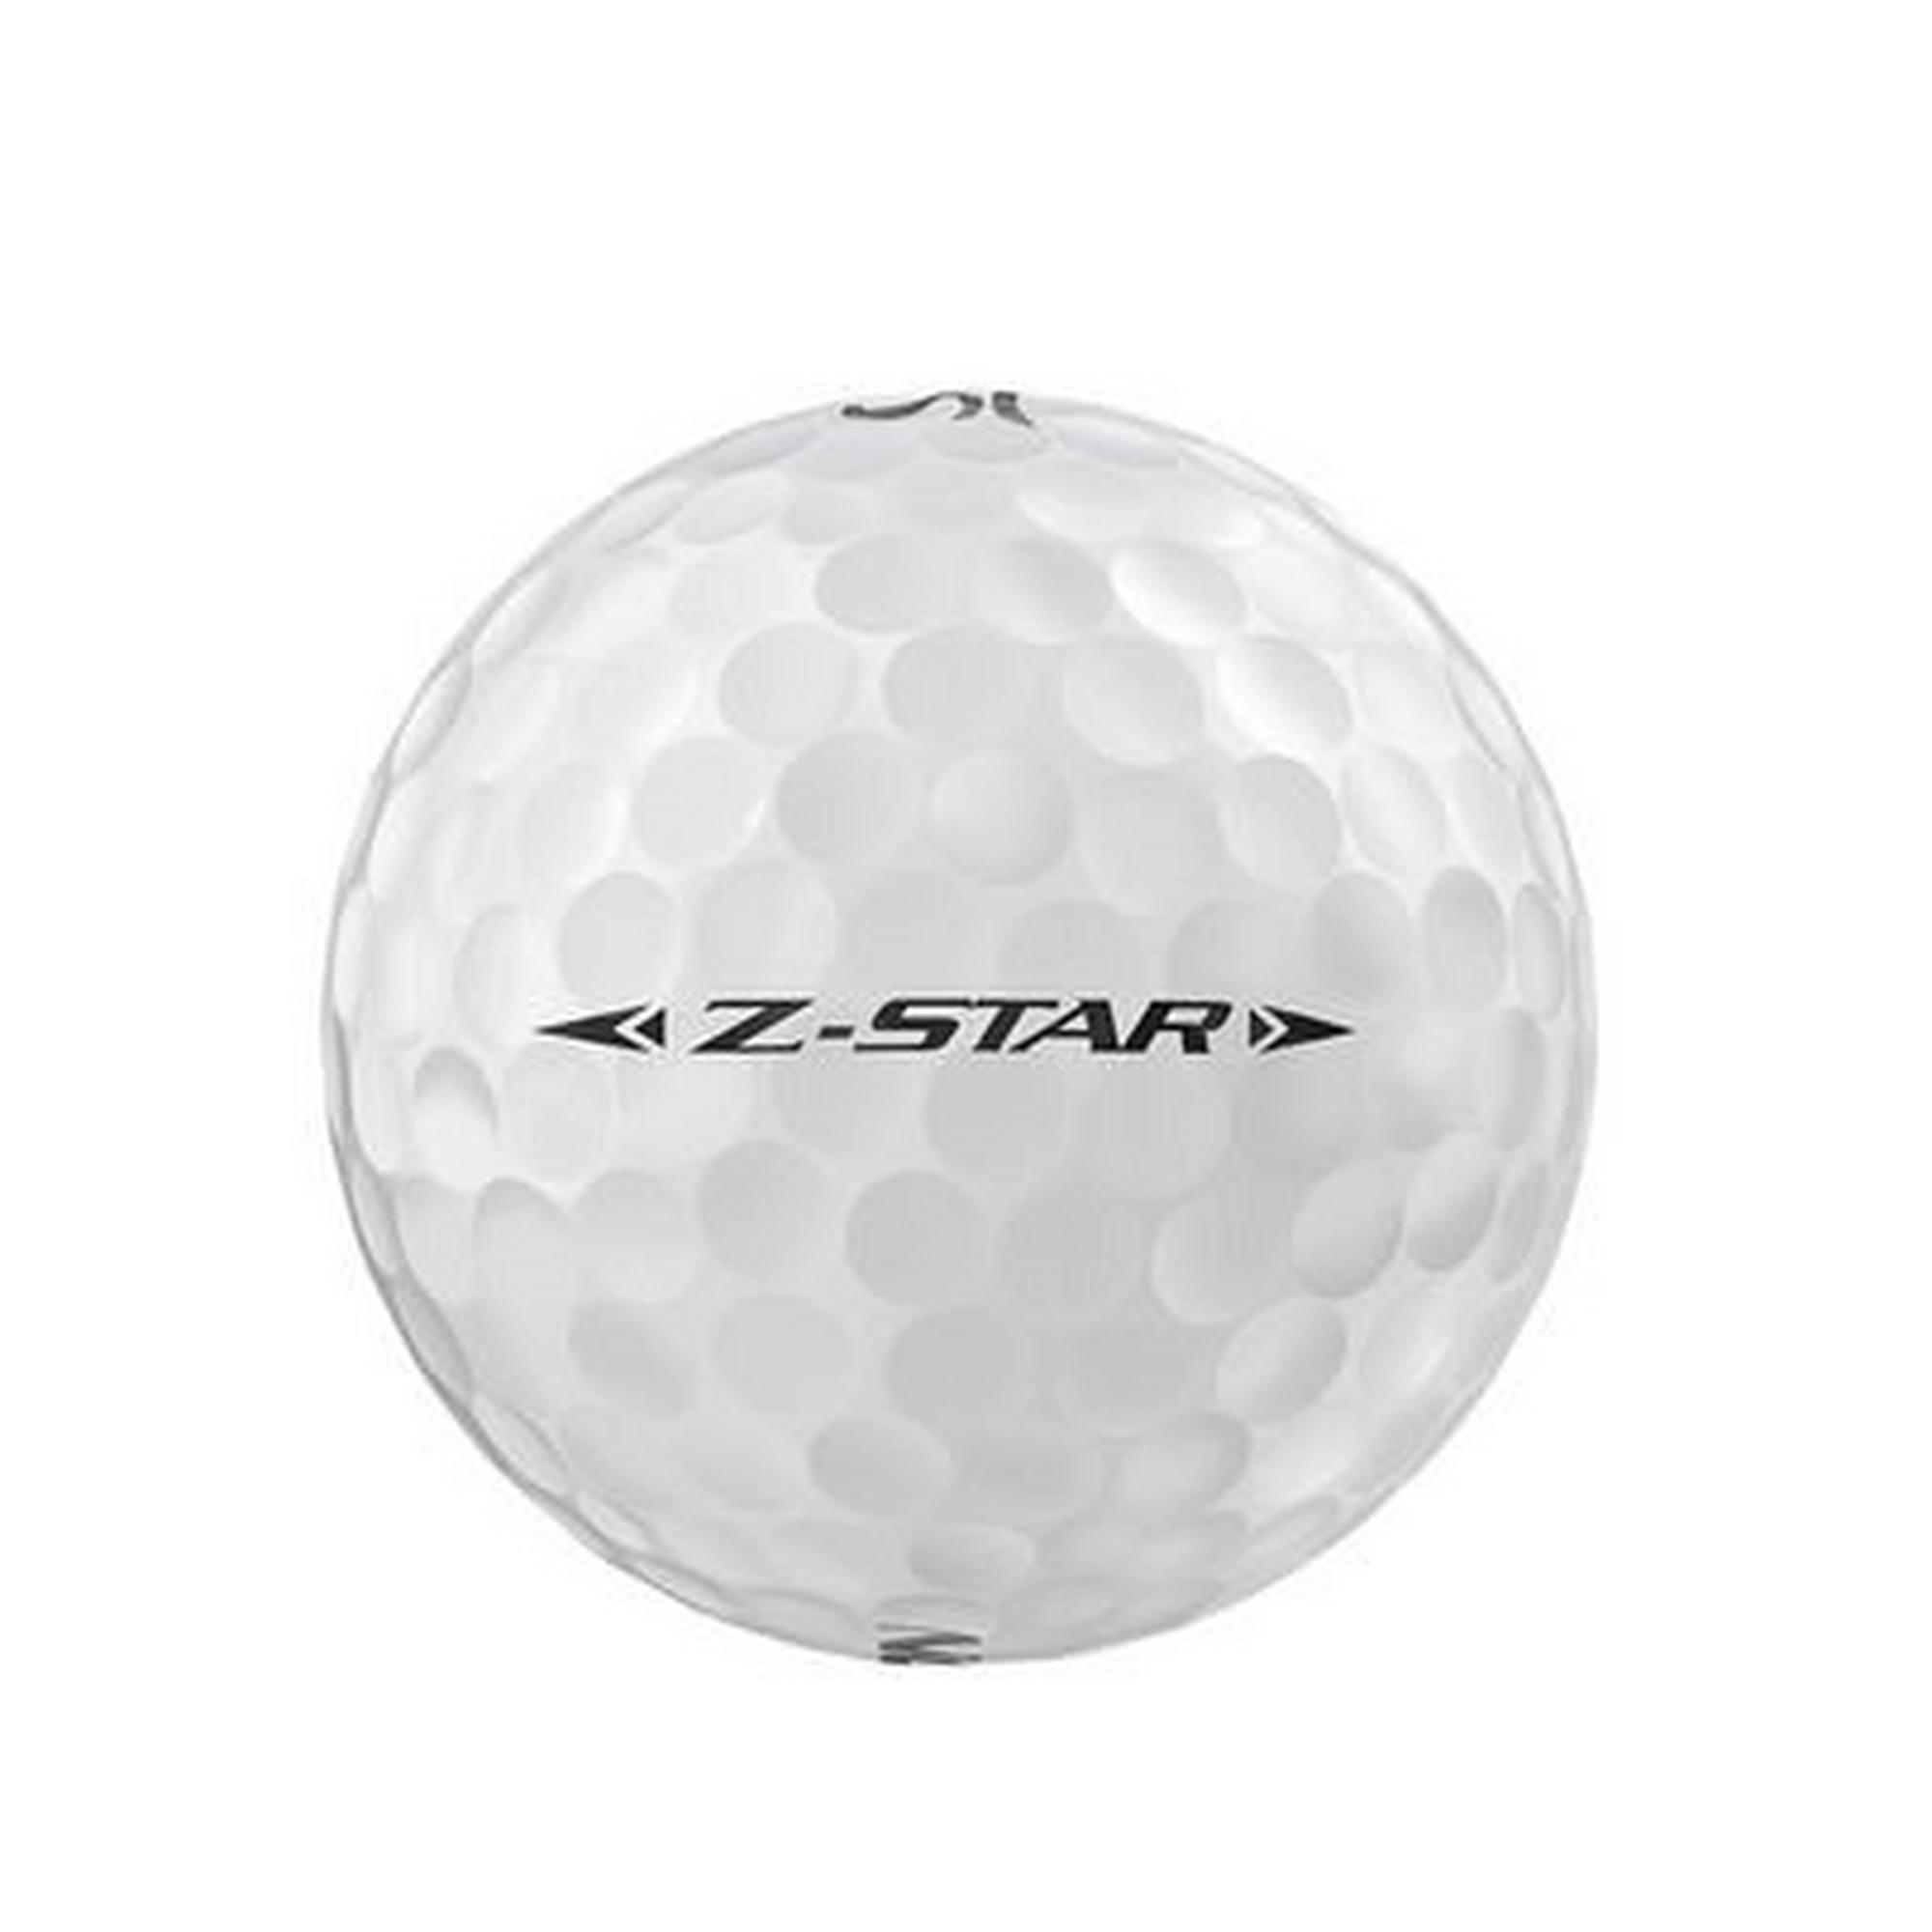 Z-STAR Tour Golf Balls - White